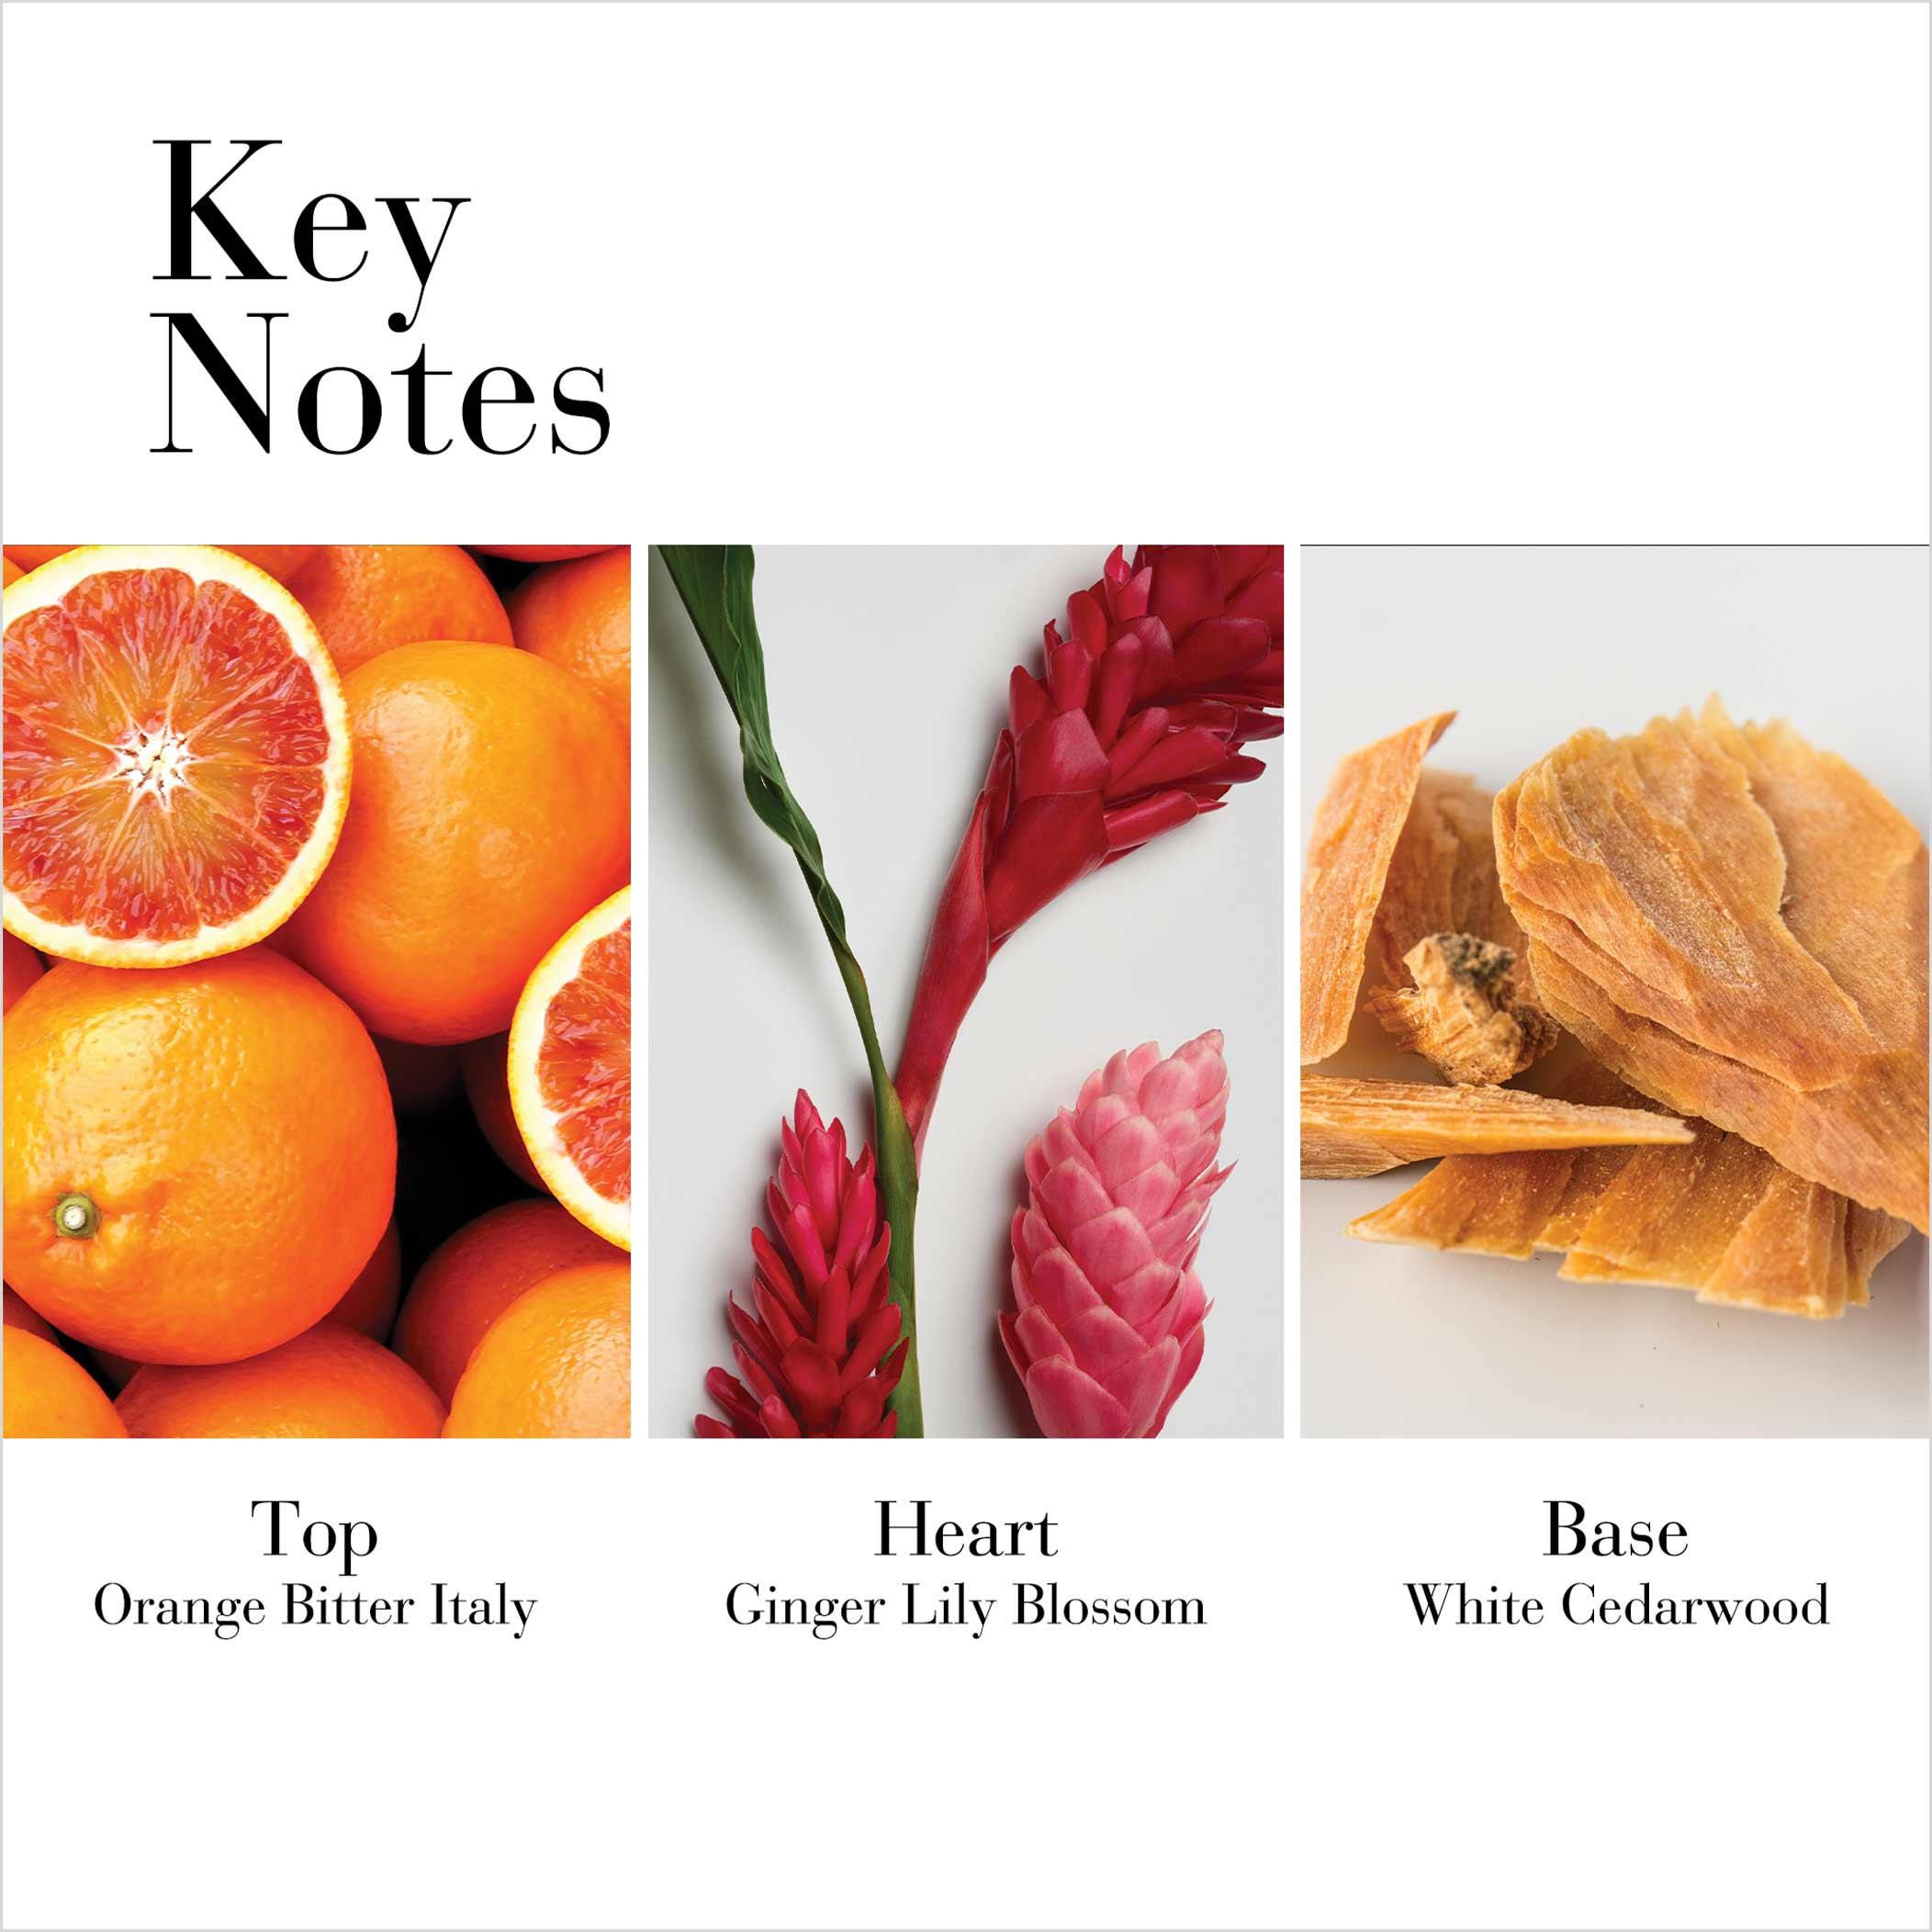 Key Notes: Orange Bitter Italy, Ginger Lily Blossom, Cedarwood